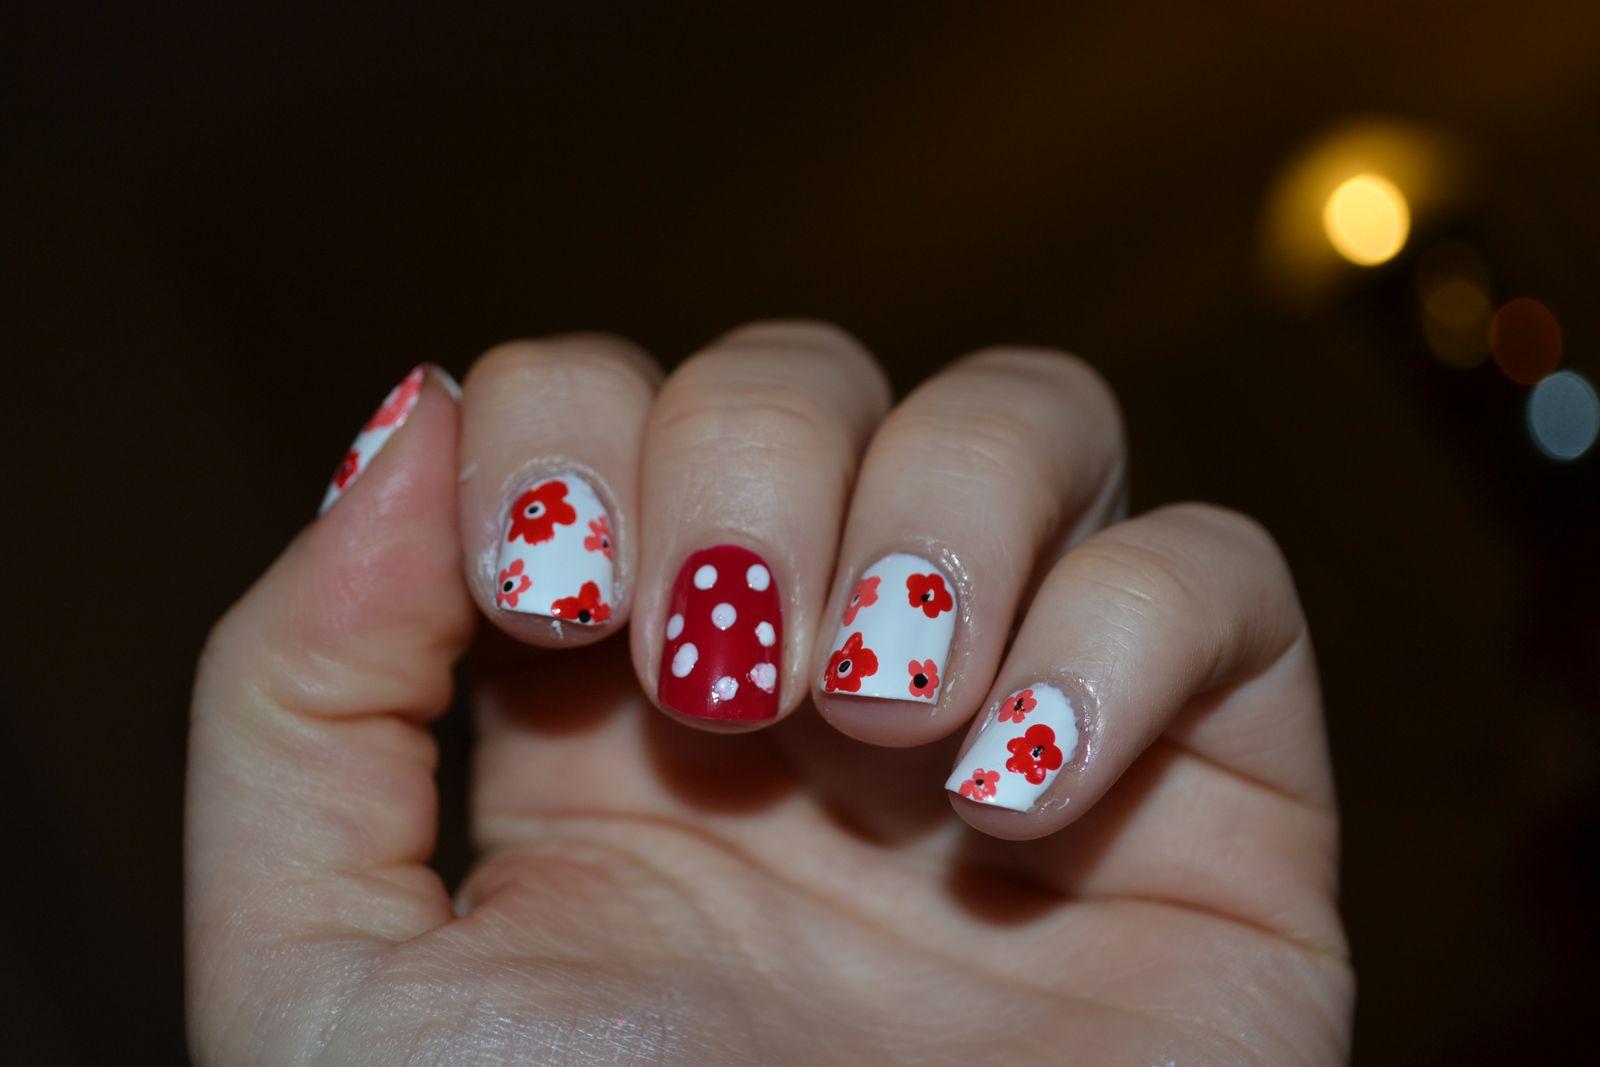 Nail art... couleurs de printemps!